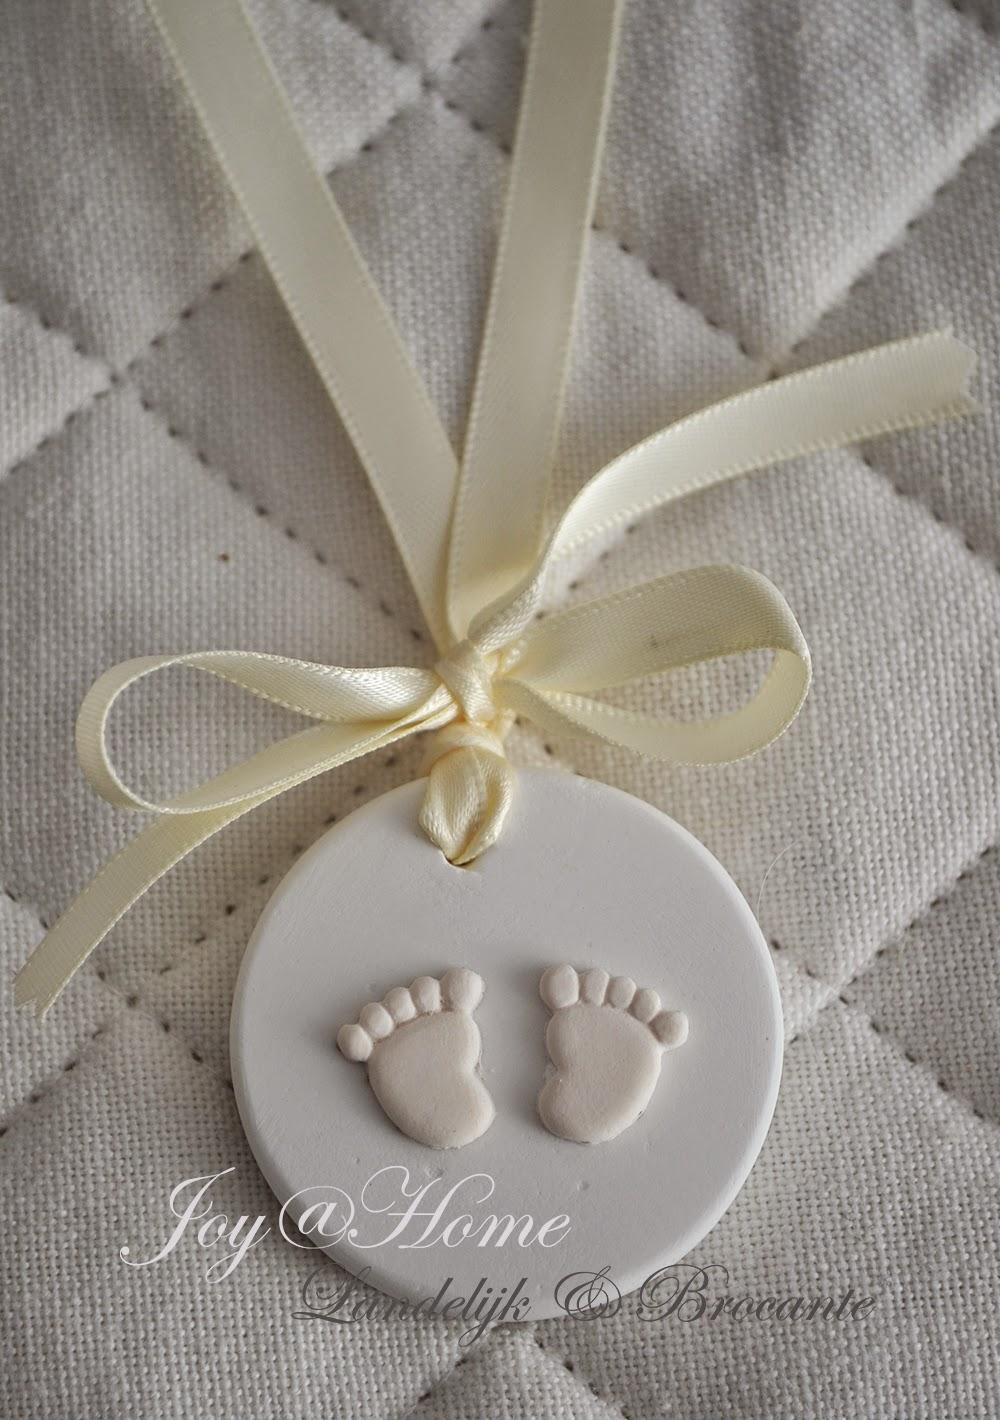 Verrassend Bedankjes & Gifts: ♥ Geboortebedankjes EC-57